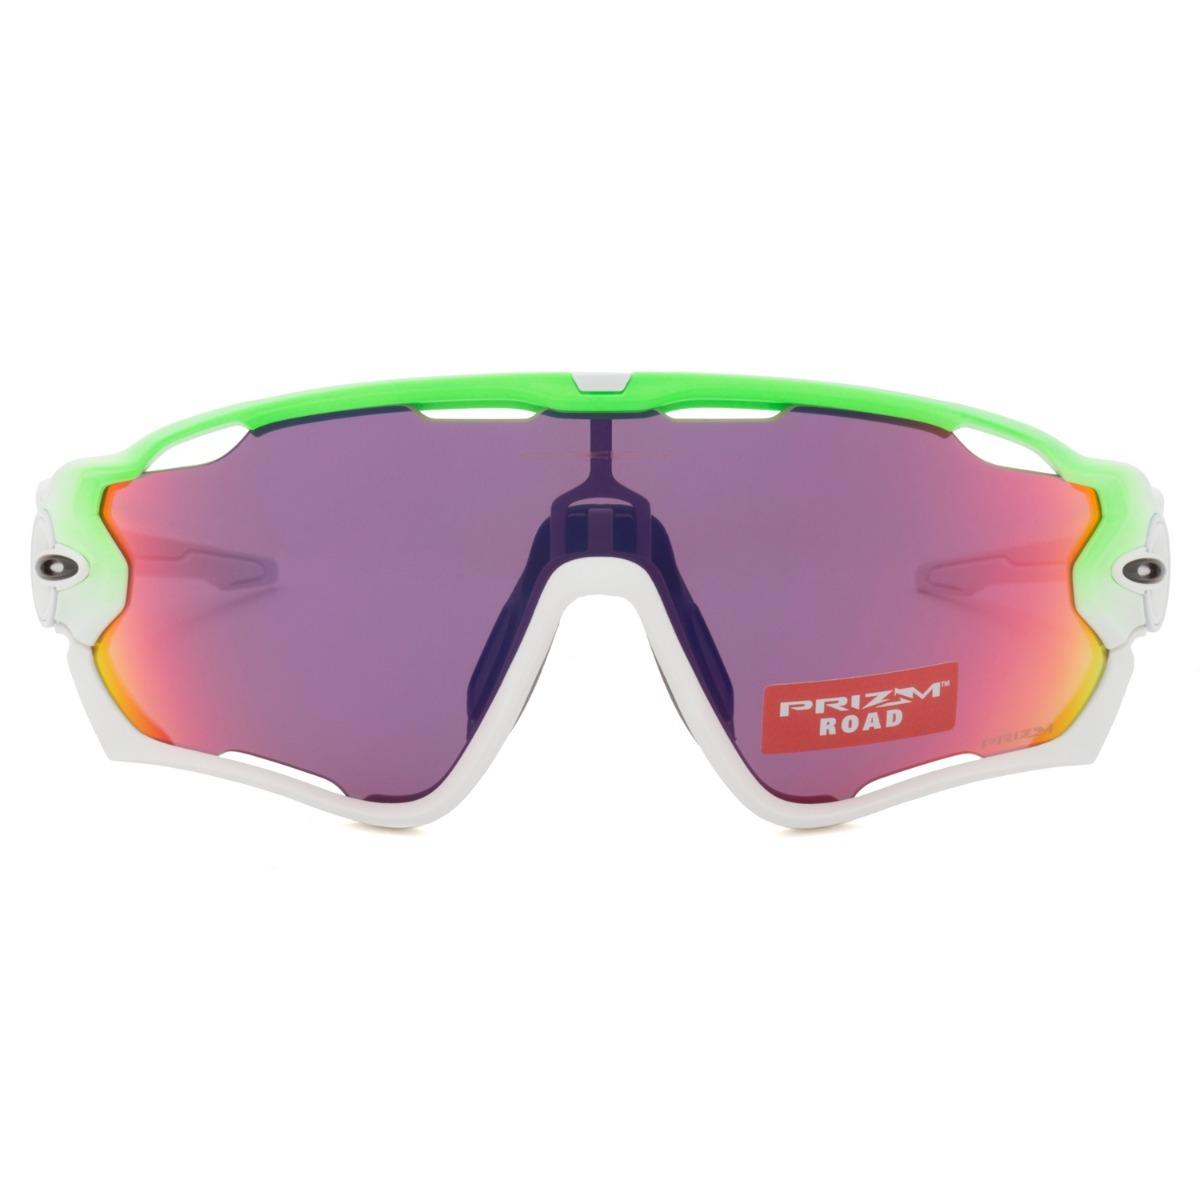 dbc737ec67e63 oakley jawbreaker prizm road sunglasses oo9290 15 special ed. Carregando  zoom.